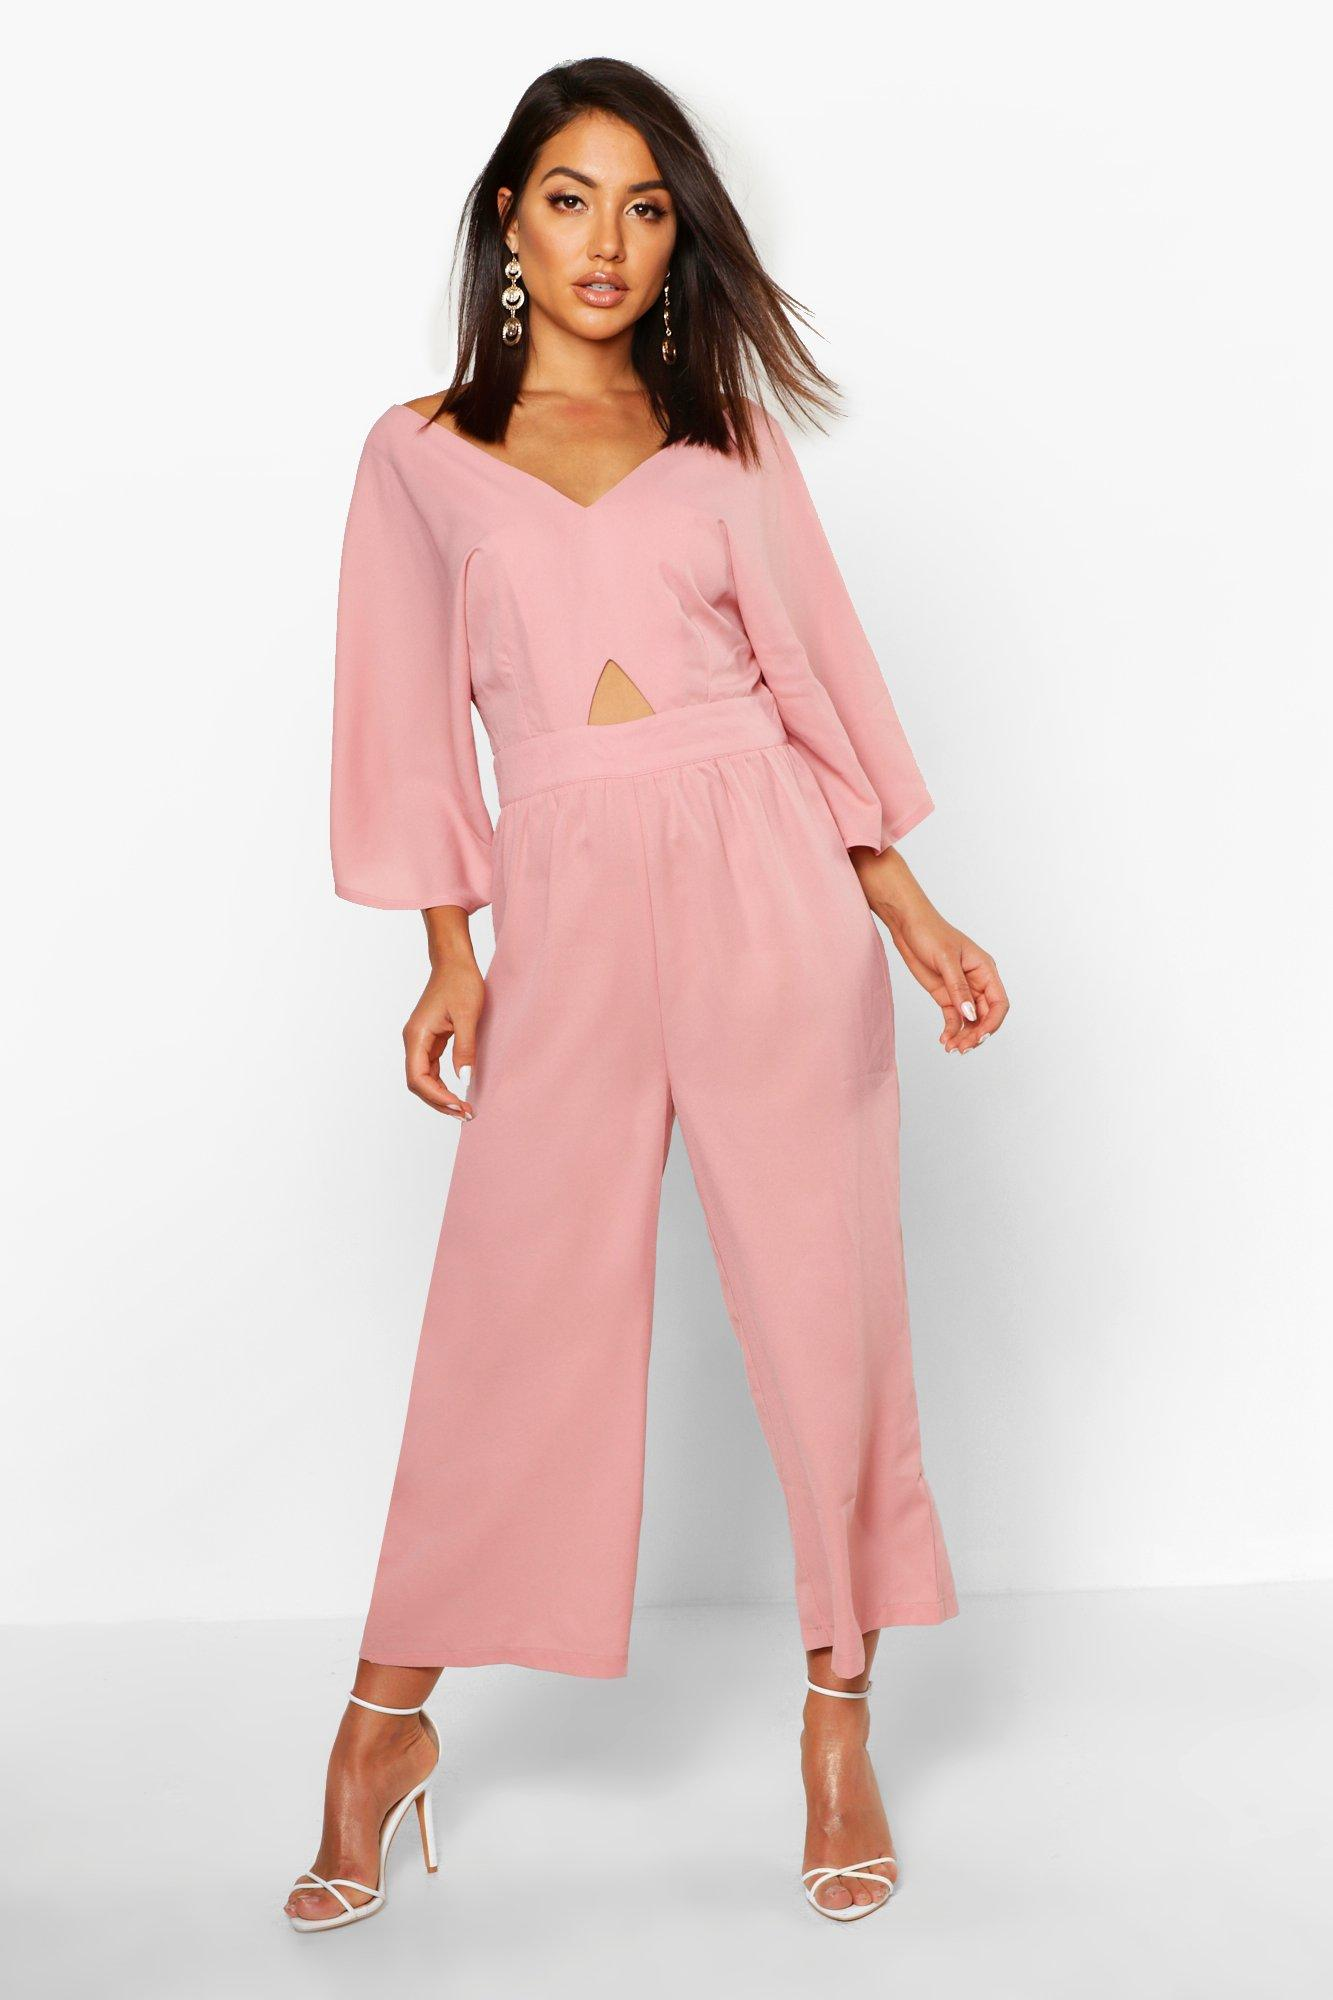 boohoo Womens Kimono Sleeve Culotte Jumpsuit - Pink - 14, Pink